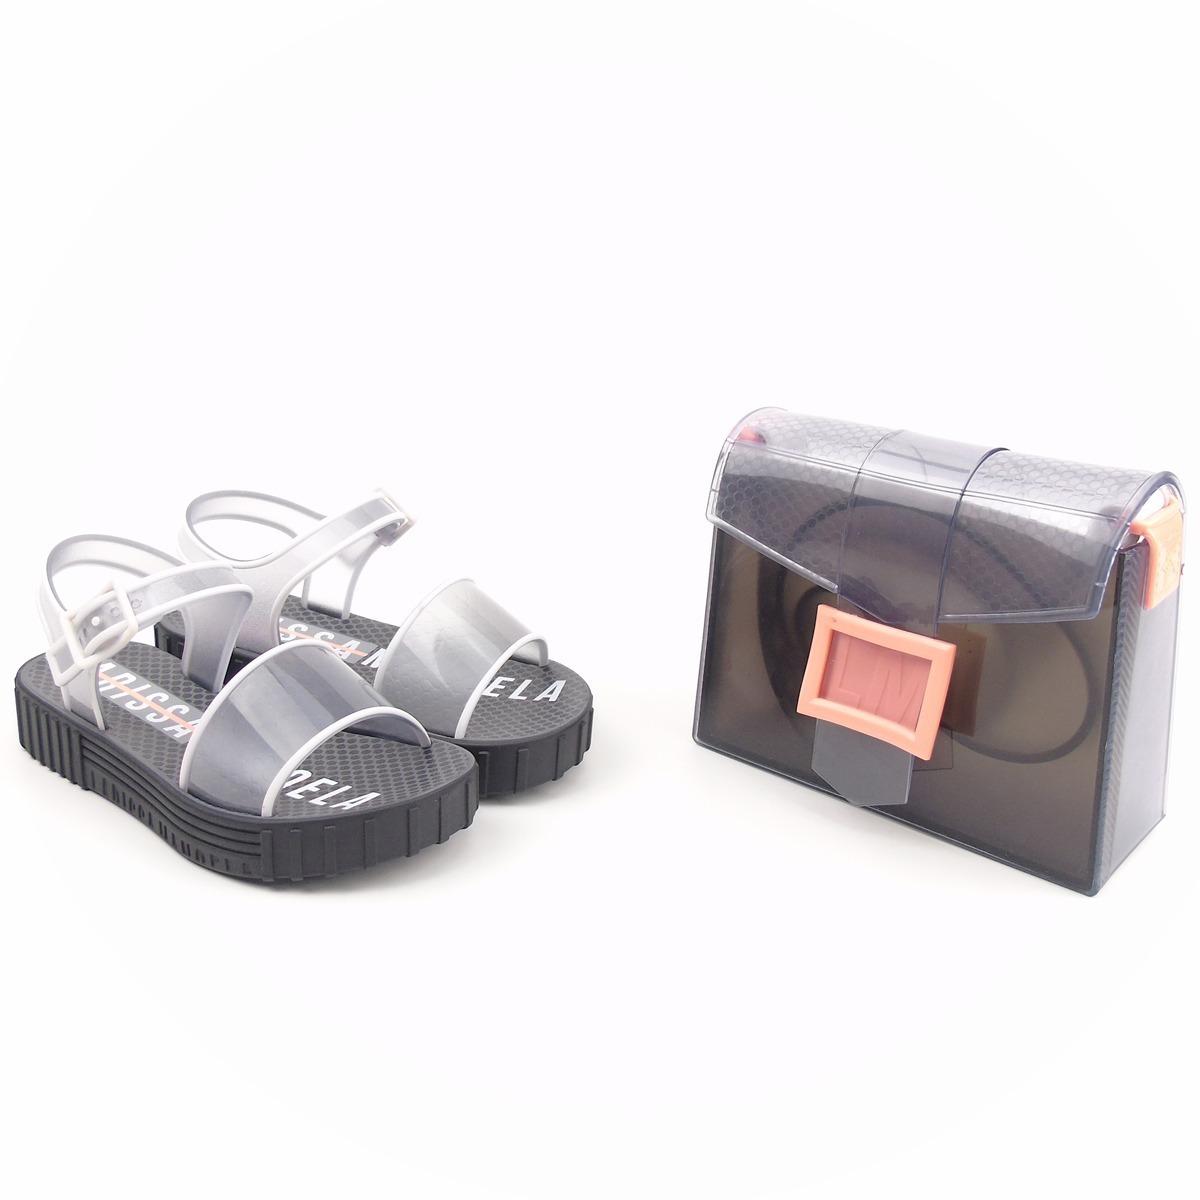 e69cc49459 sandália larissa manoela go fashion - bolsa de brinde 21897. Carregando  zoom.